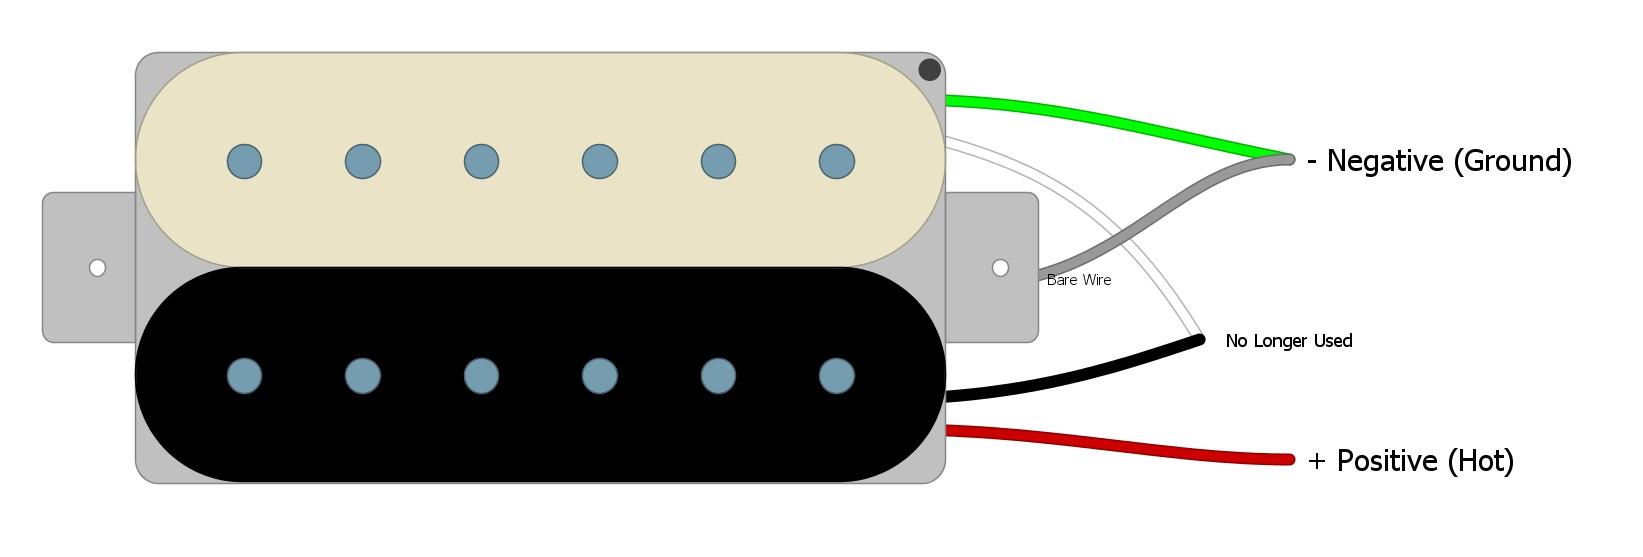 Dimarzio IGNO Wiring Diagram – Humbucker SoupHumbucker Soup